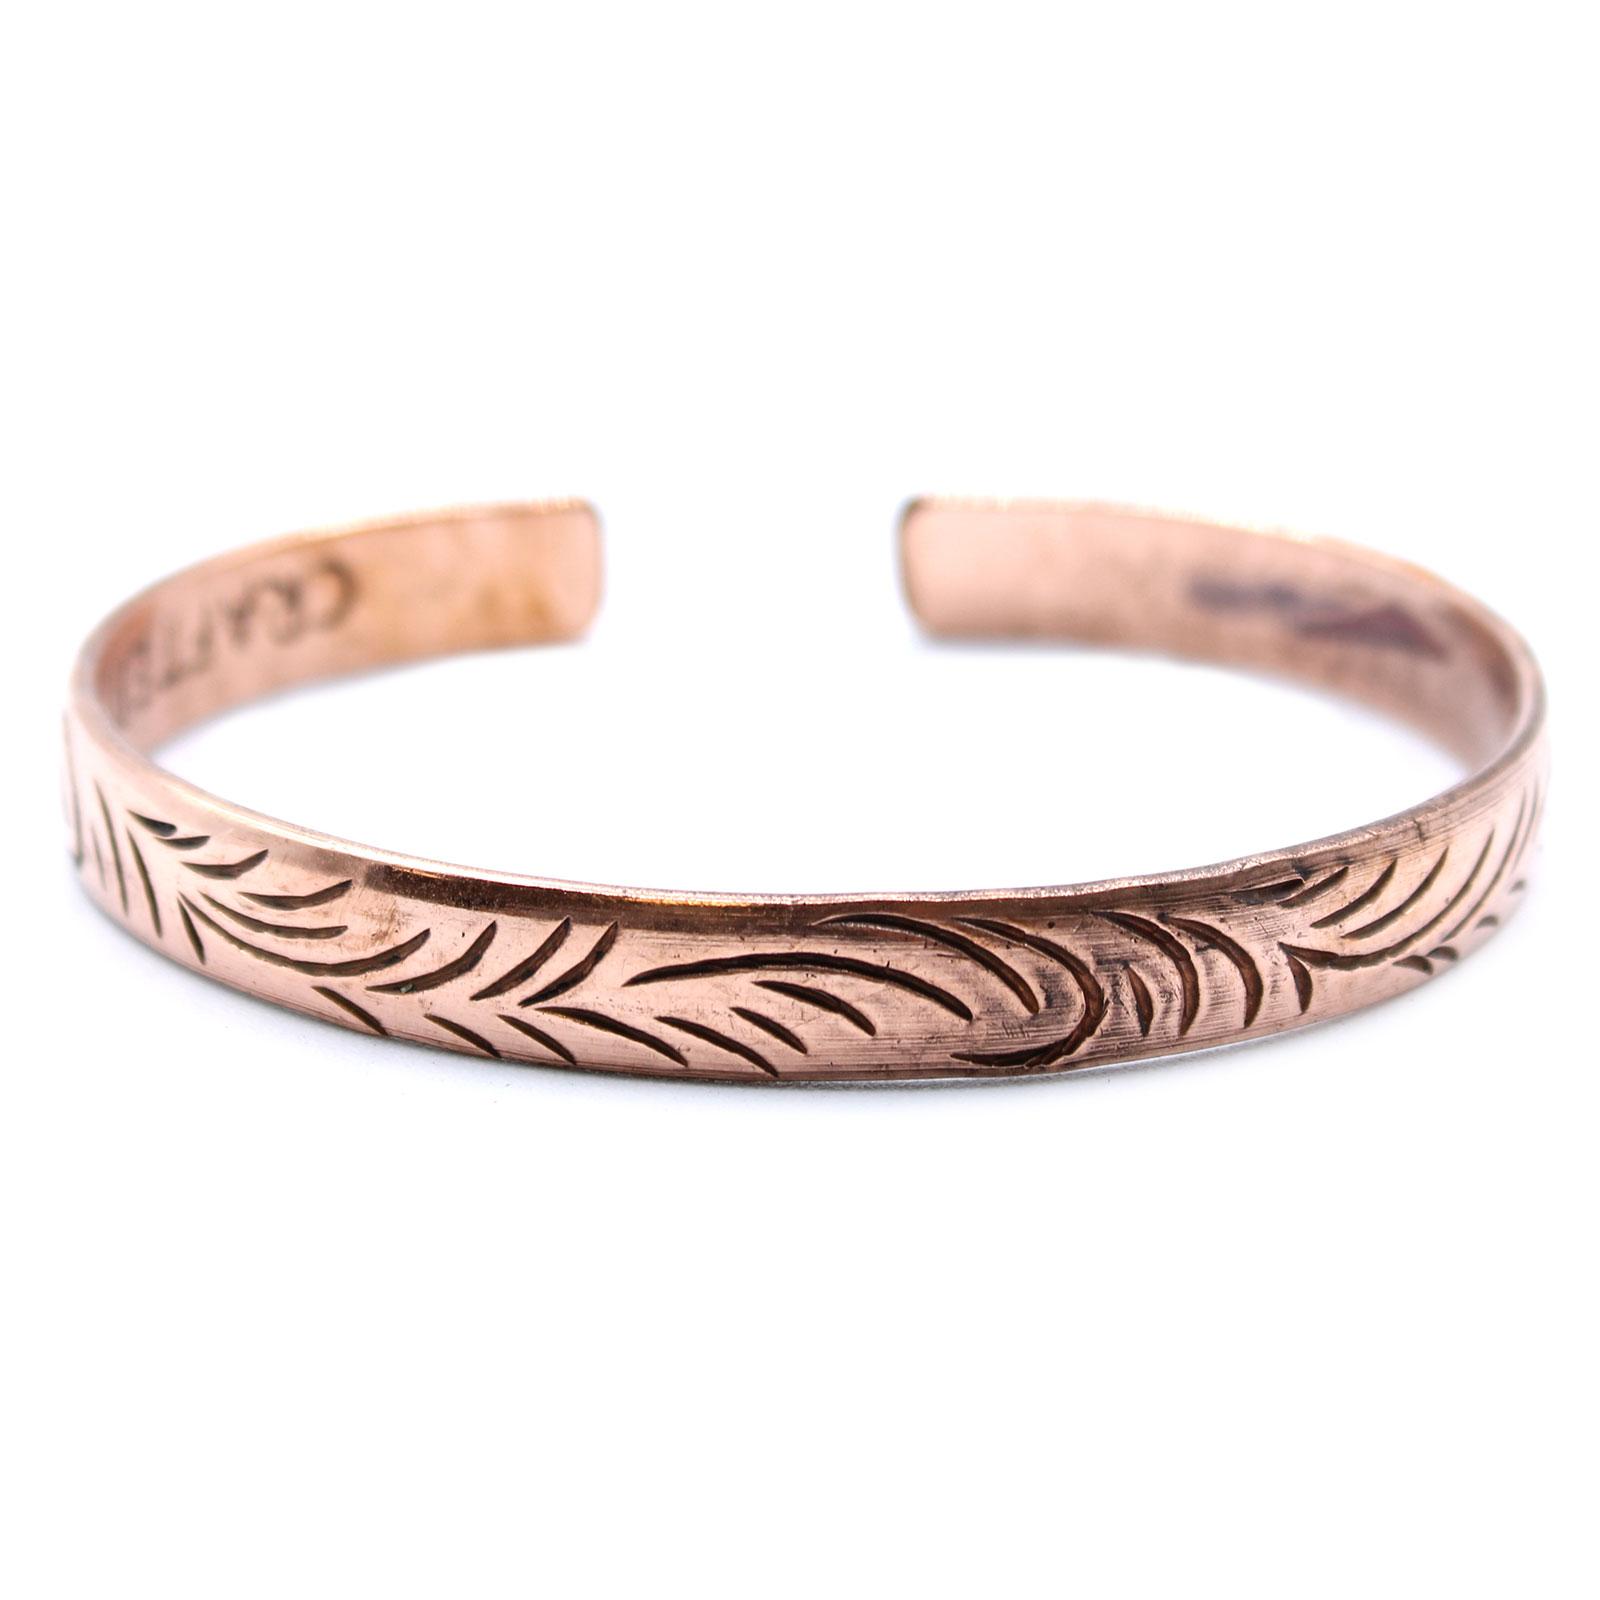 Copper Tibetan Bracelet Slim Tribal  Swirls